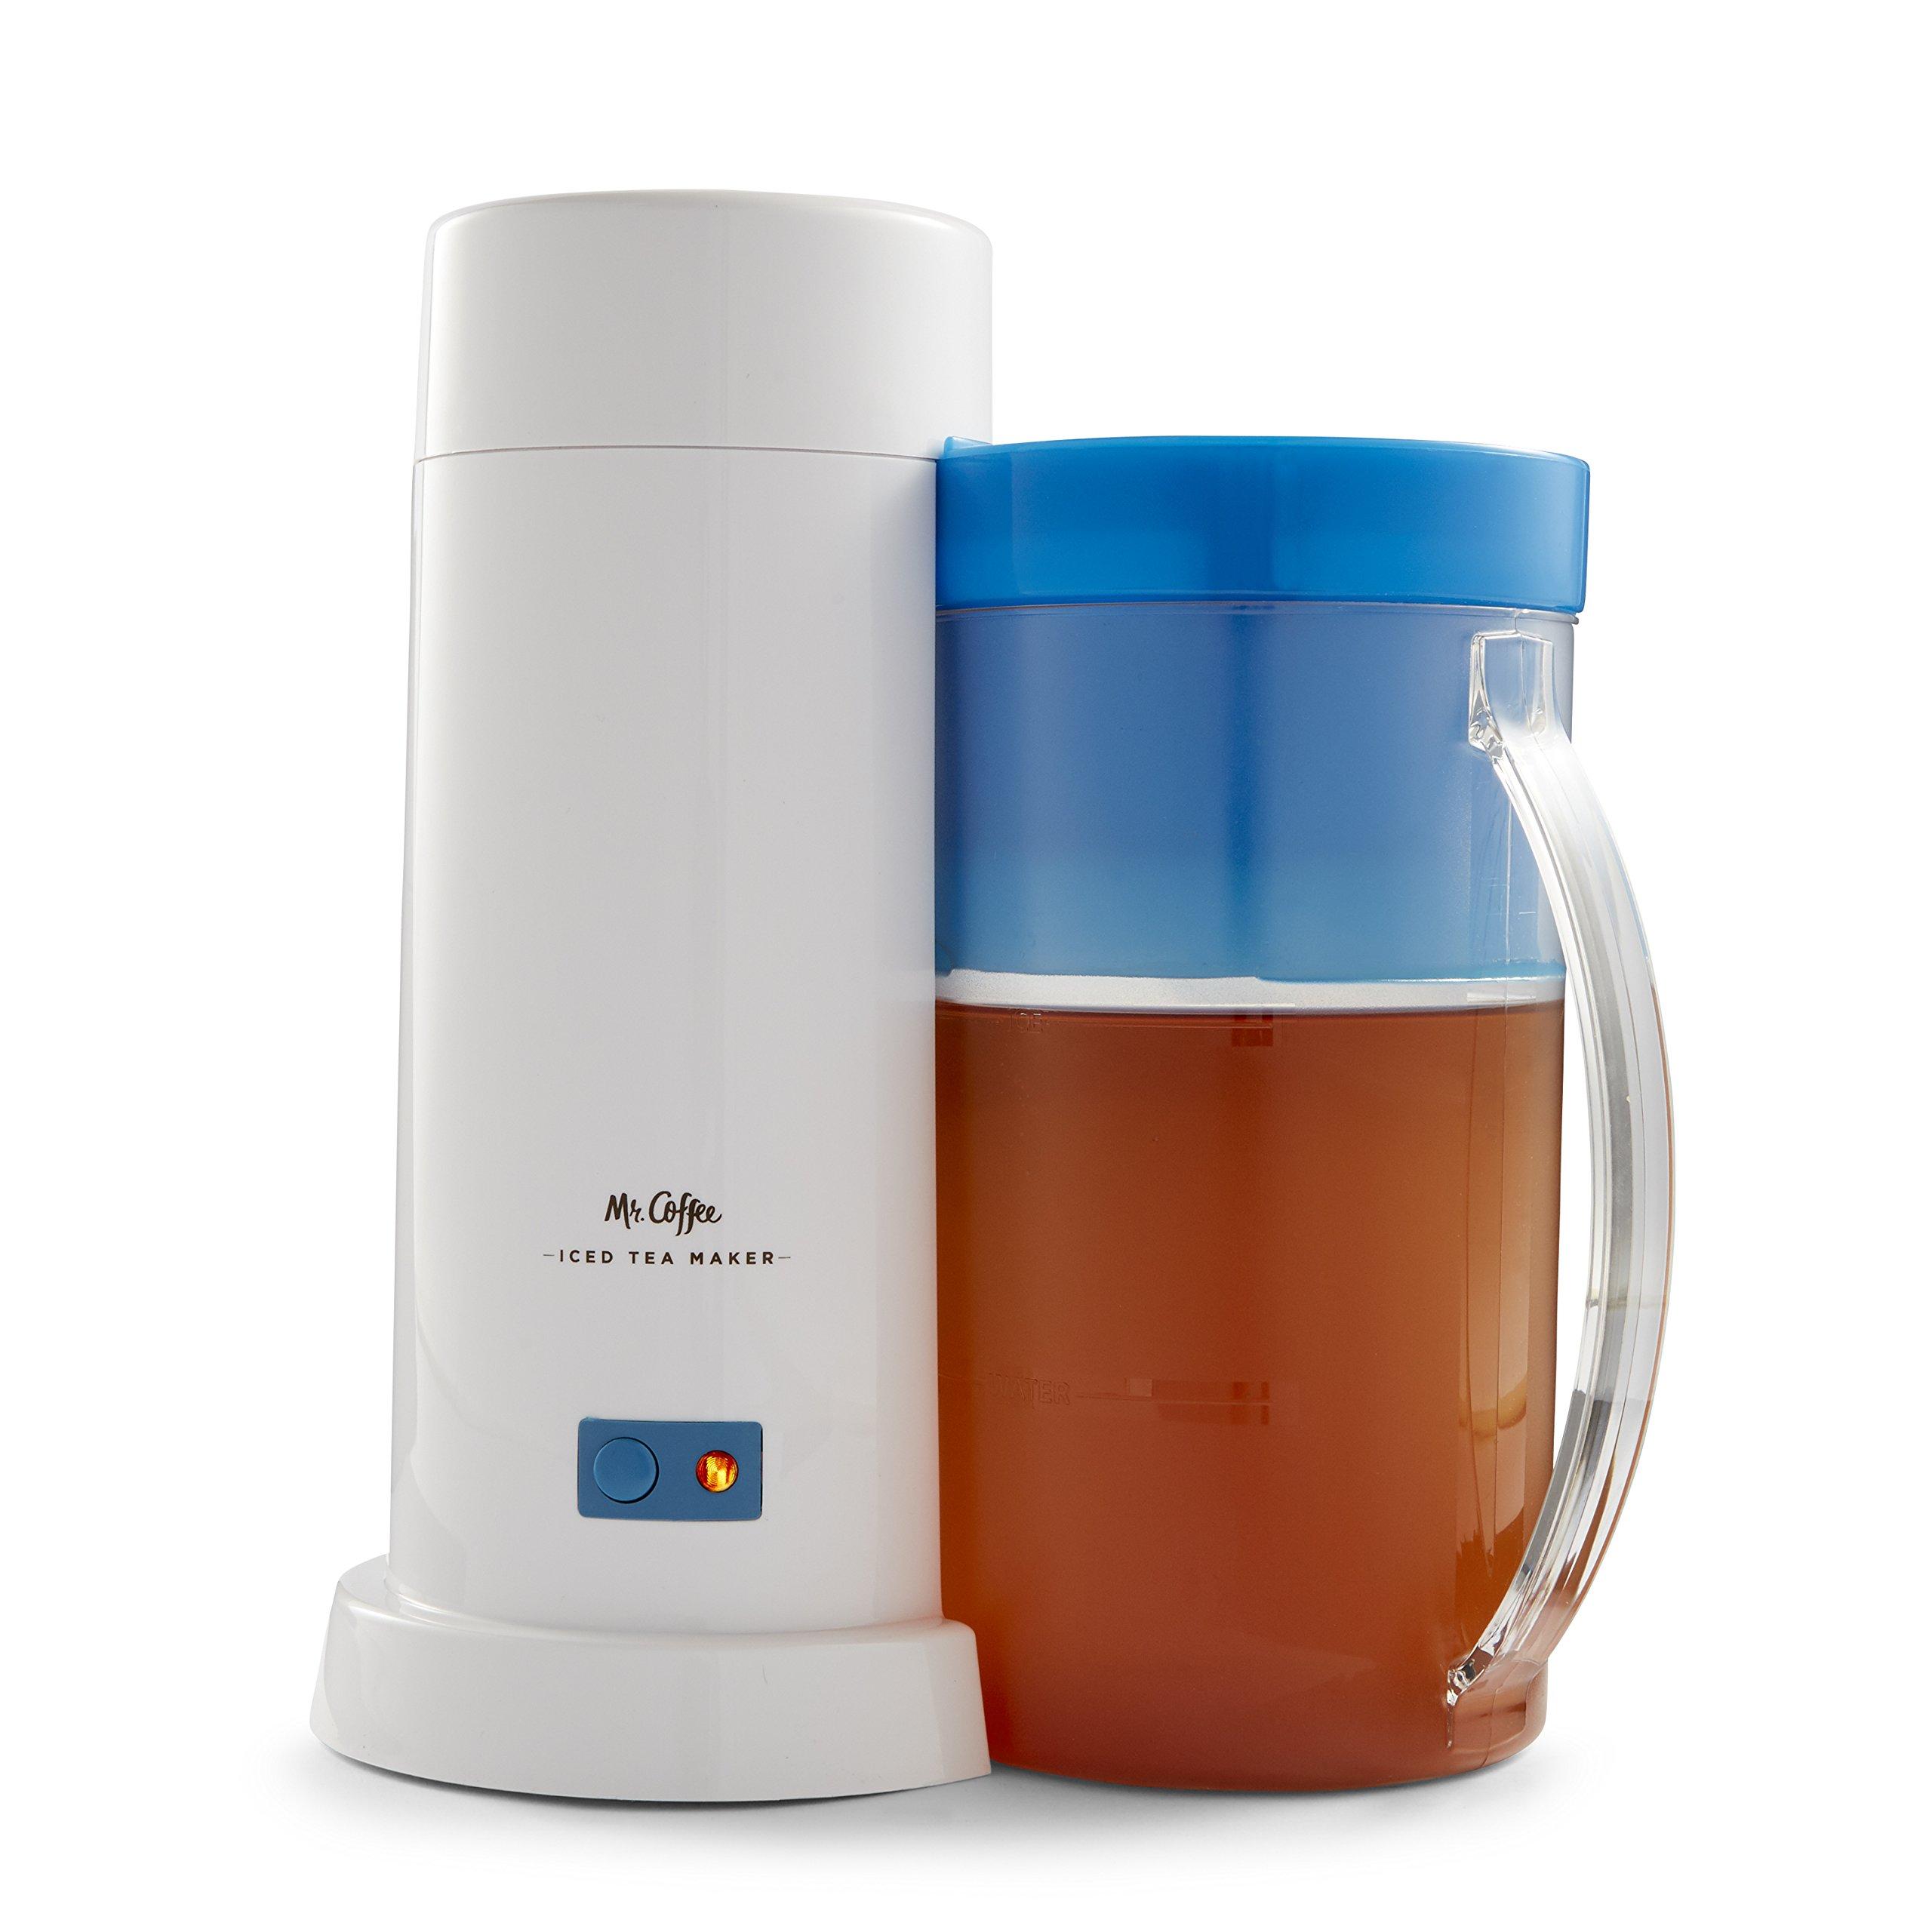 Mr. Coffee 2-Quart Iced Tea & Iced Coffee Maker, Blue by Mr. Coffee